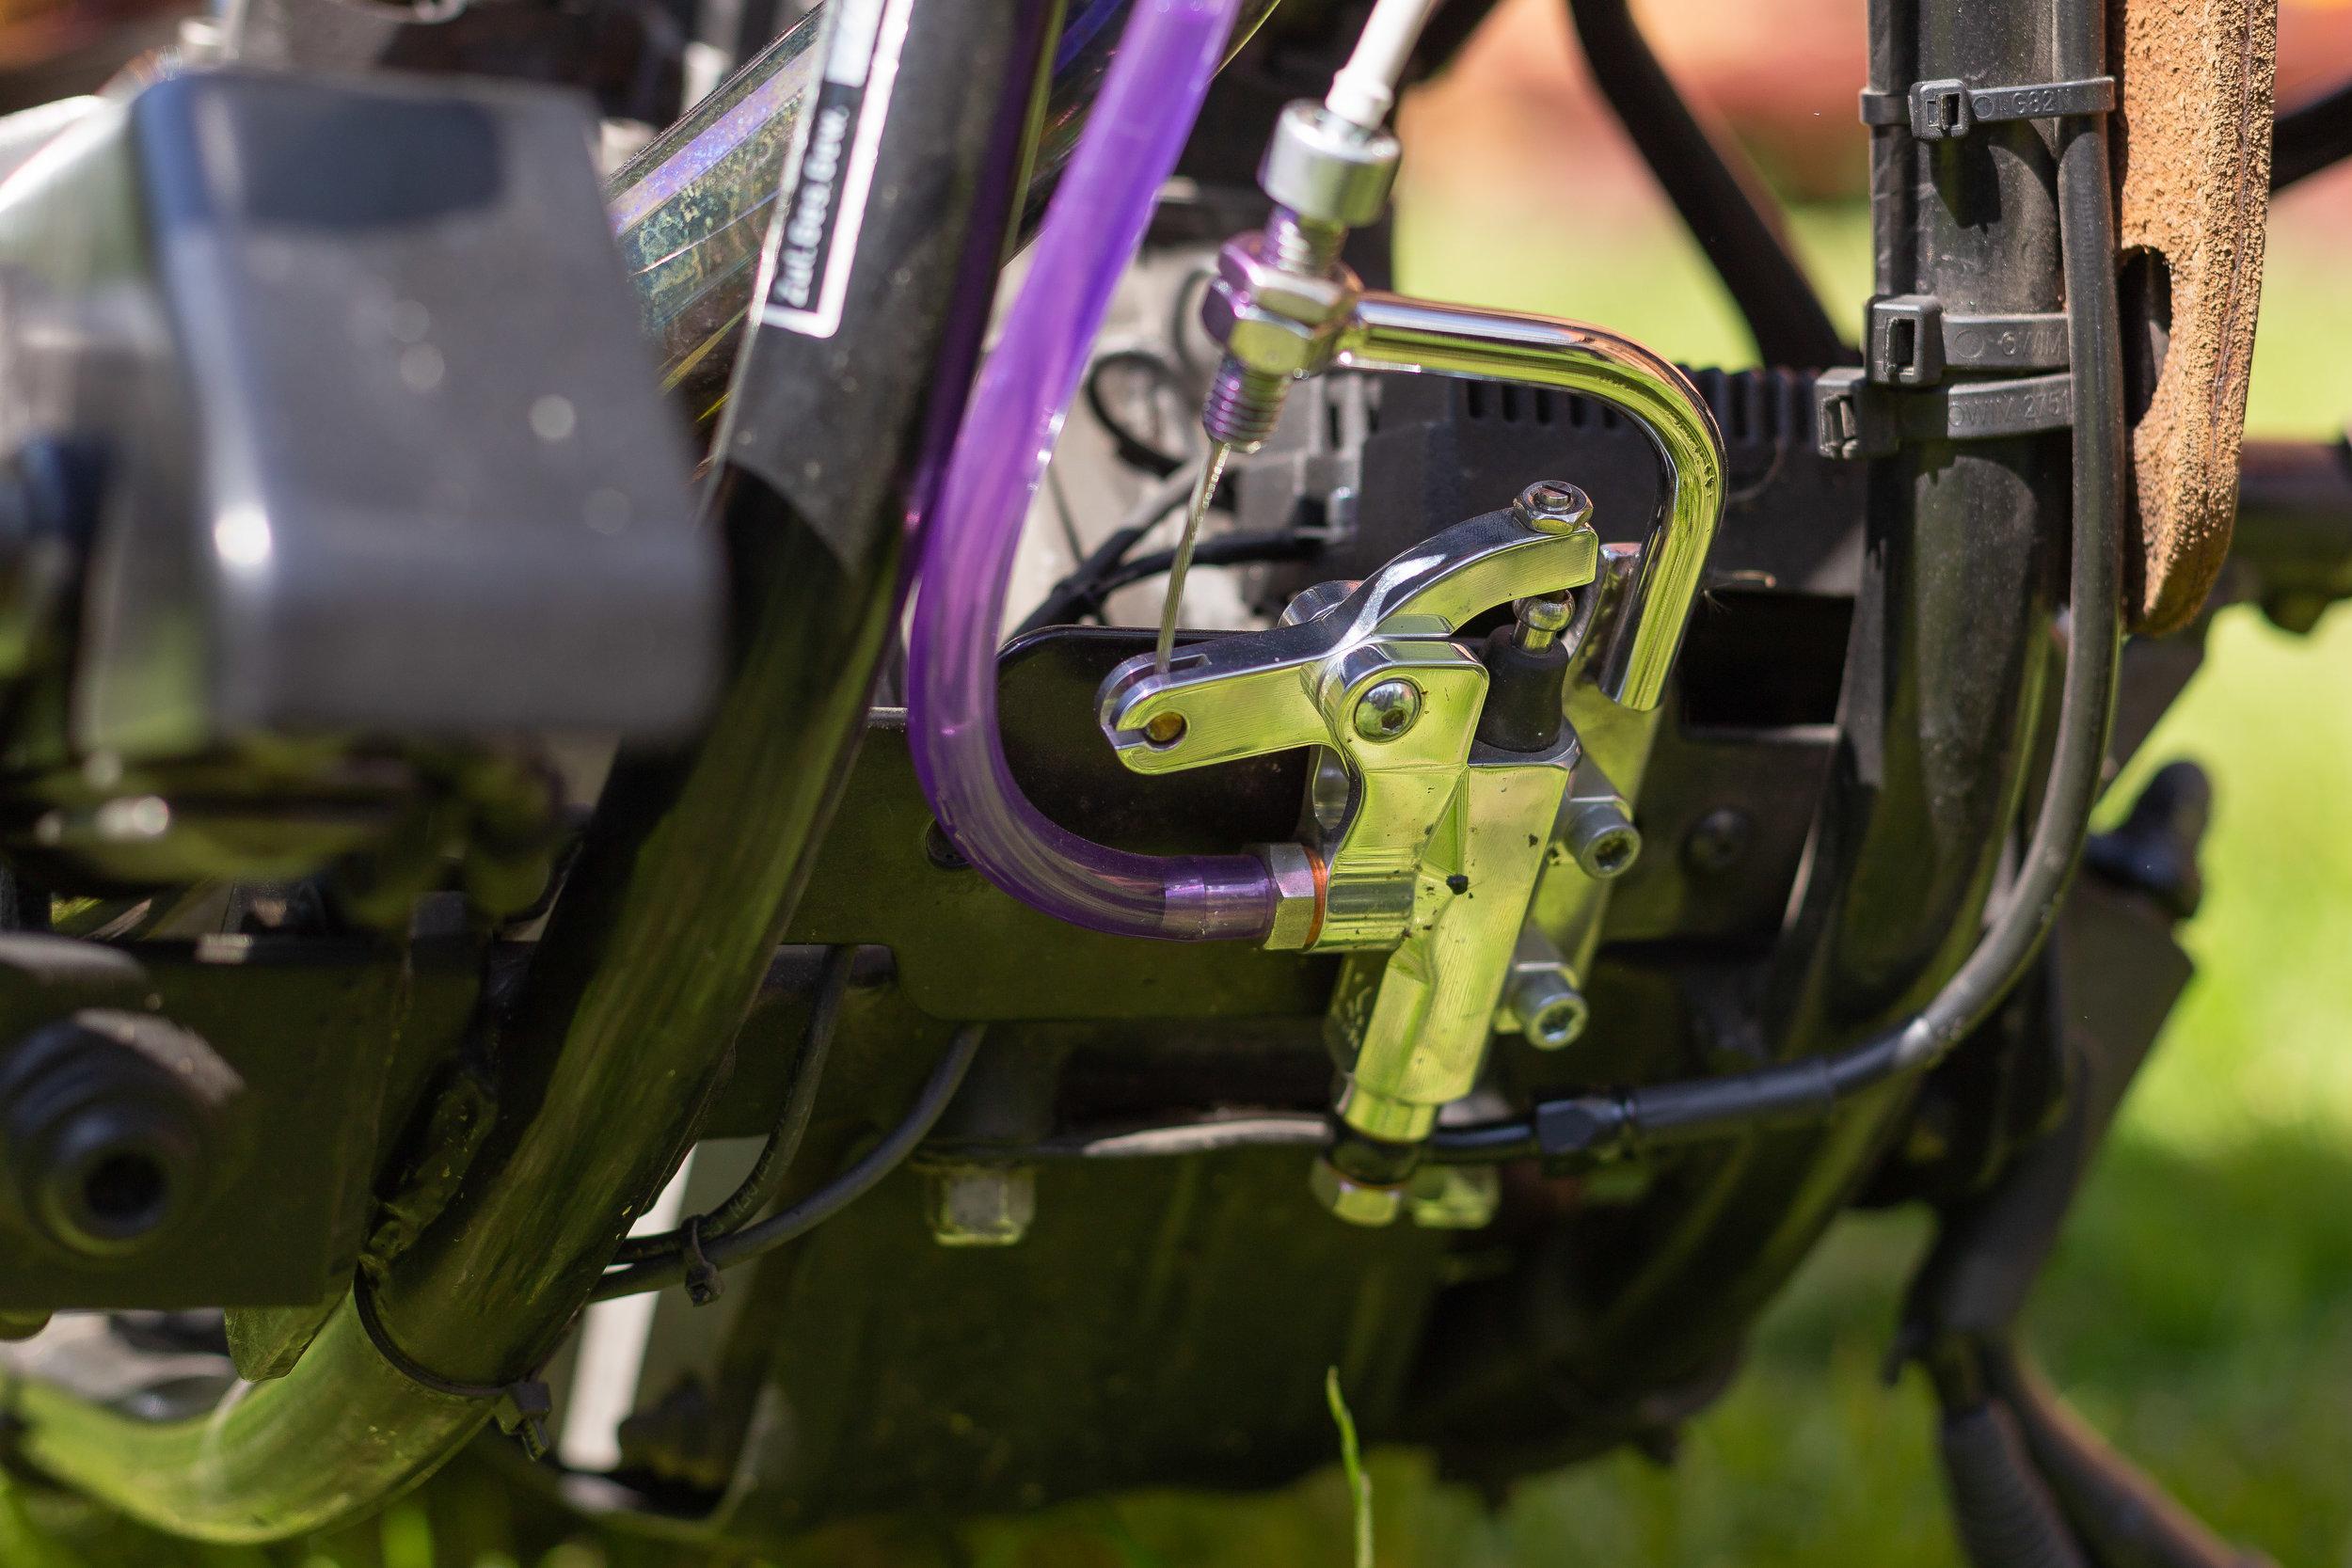 (c) Stefan Weidner Fotografie_Toxic Bikes_Karls Ofen_10-05-2018_IMG-0177.jpg